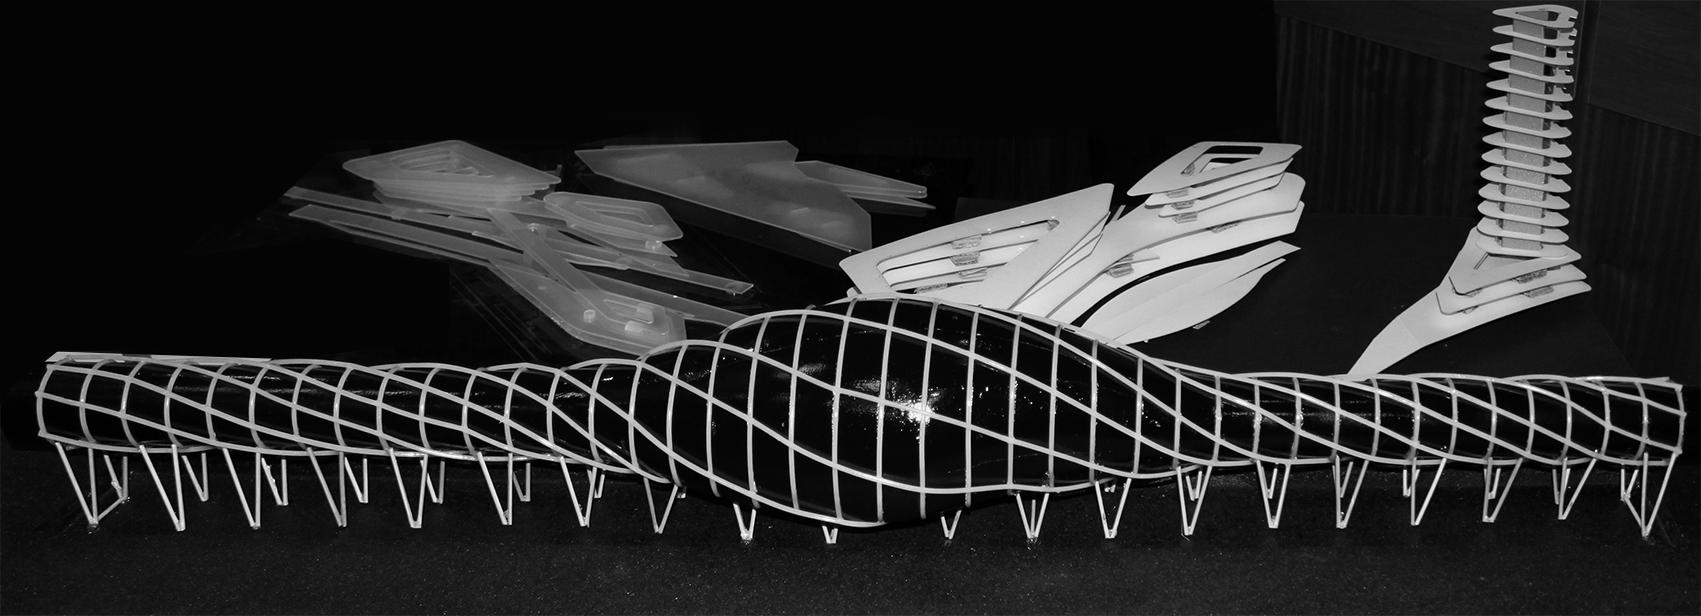 Railway station model | Material: wood